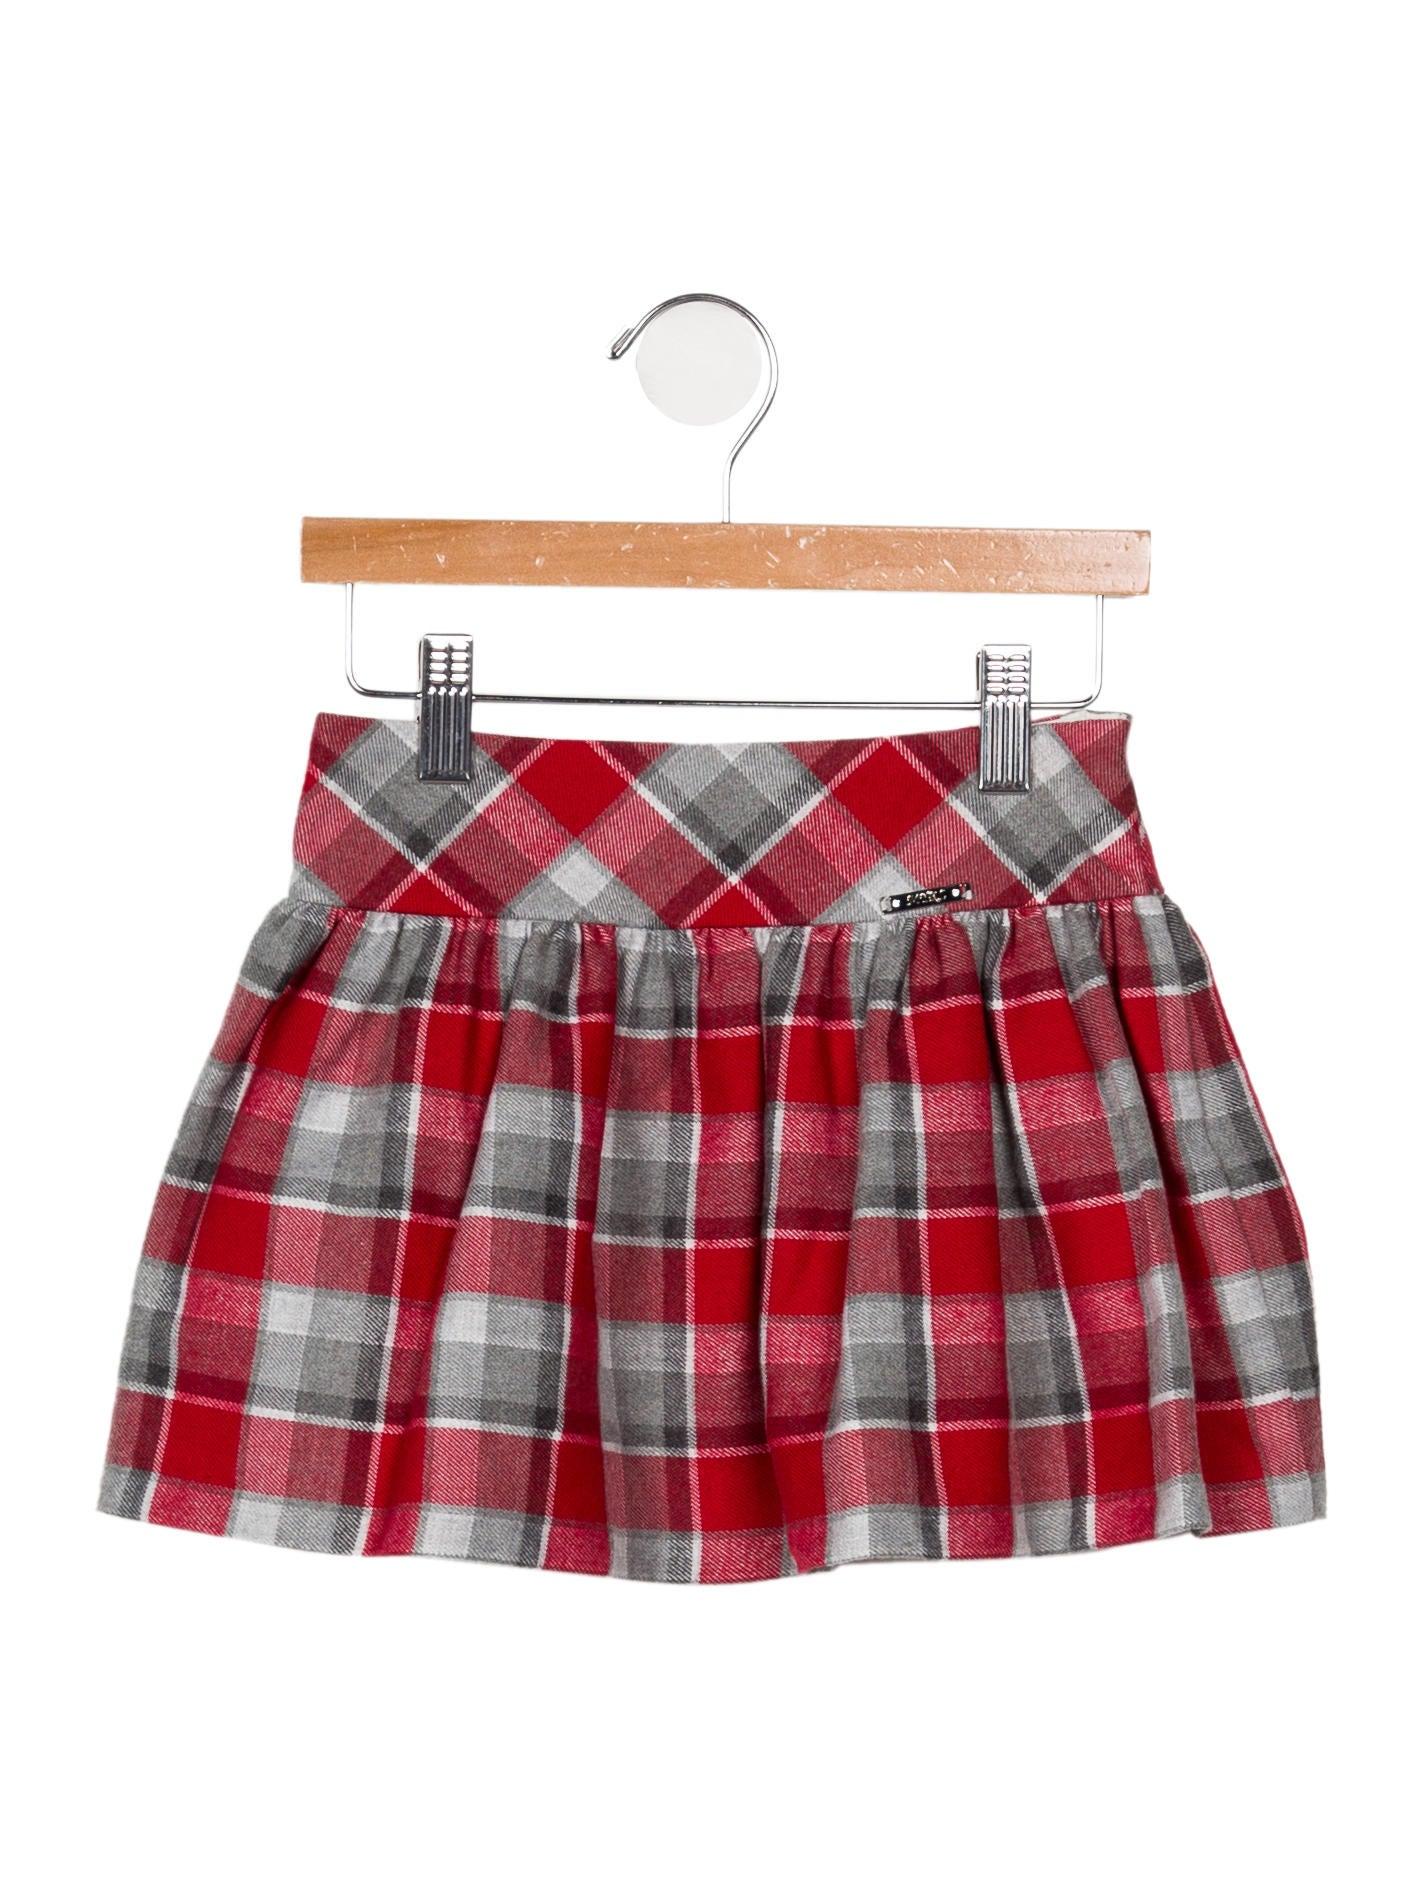 3dd74feb3 Mayoral Girls' Plaid Mini Skirt - Girls - WMAYL20156 | The RealReal